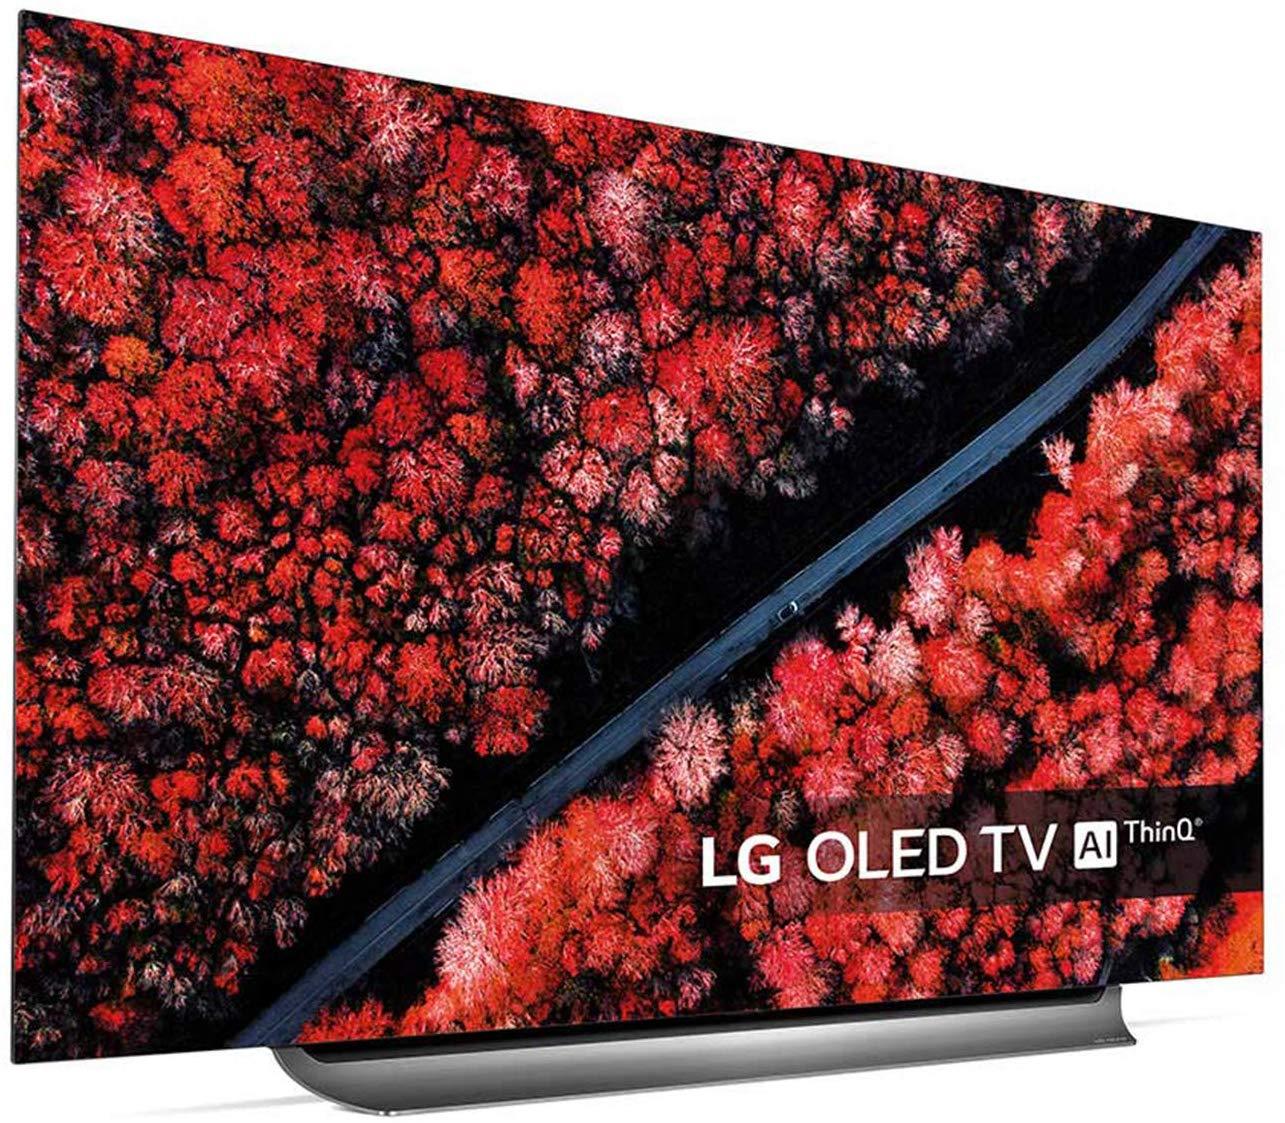 "LG OLED65C9PLA 65"" 4K Ultra HD HDR Smart OLED TV - £1999 using code @ PRC Direct + Free 2 4k Blu-ray Dics + Free Sky Q for 18 months"